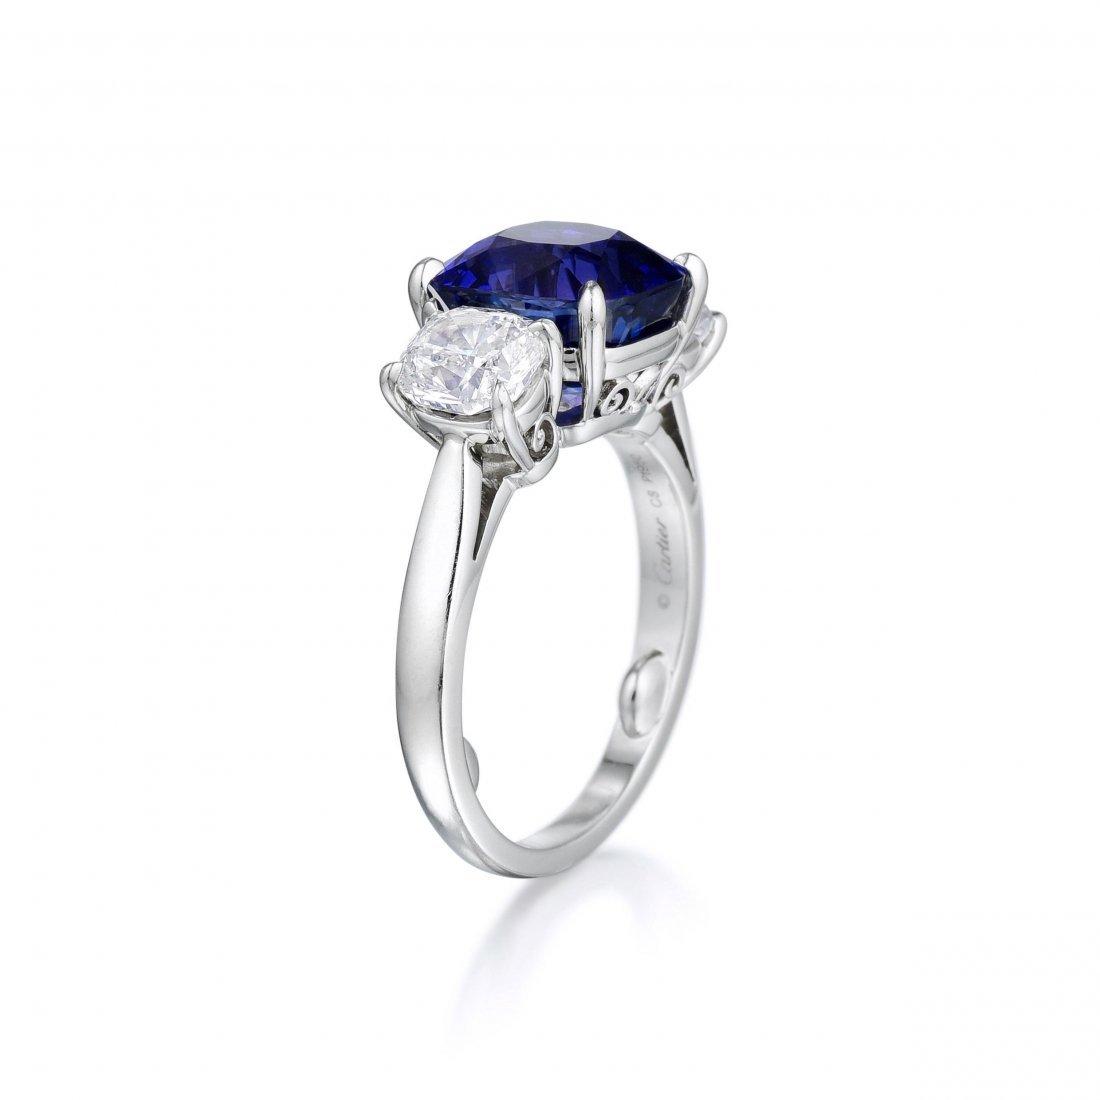 Cartier 6.69-Carat Burmese Sapphire and Diamond Ring - 3